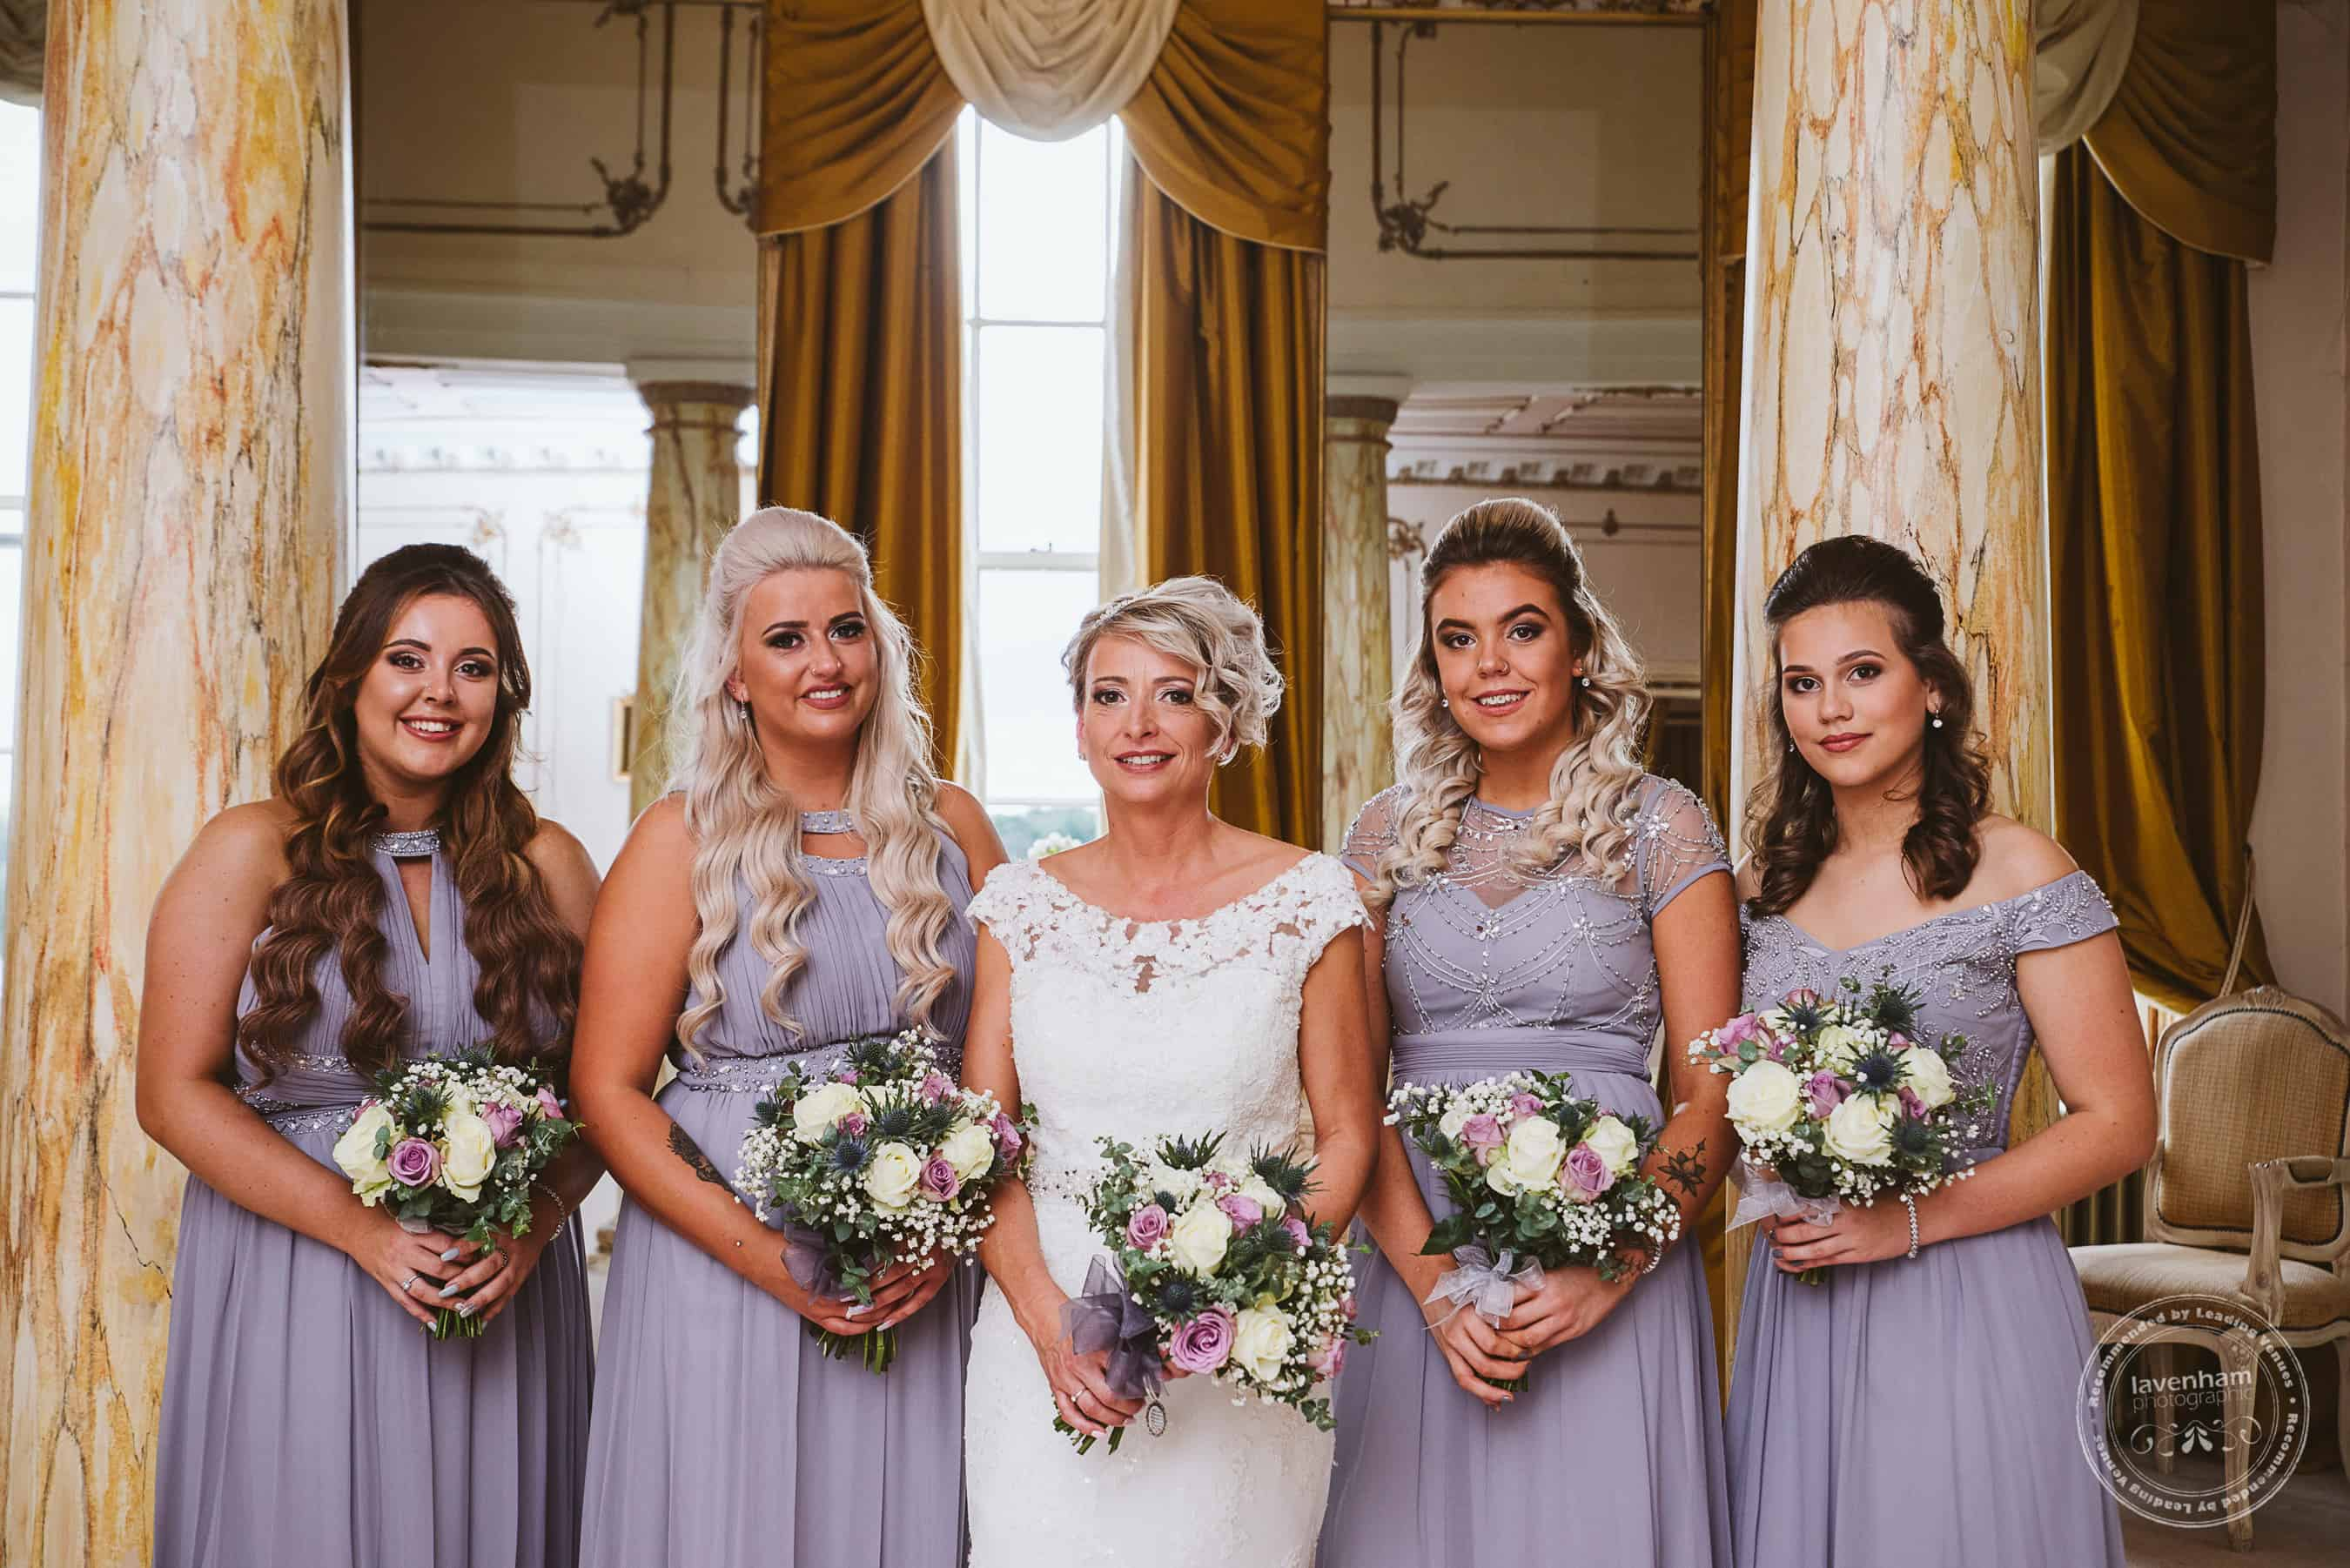 281018 Gosfield Hall Wedding Photography Lavenham Photographic 039